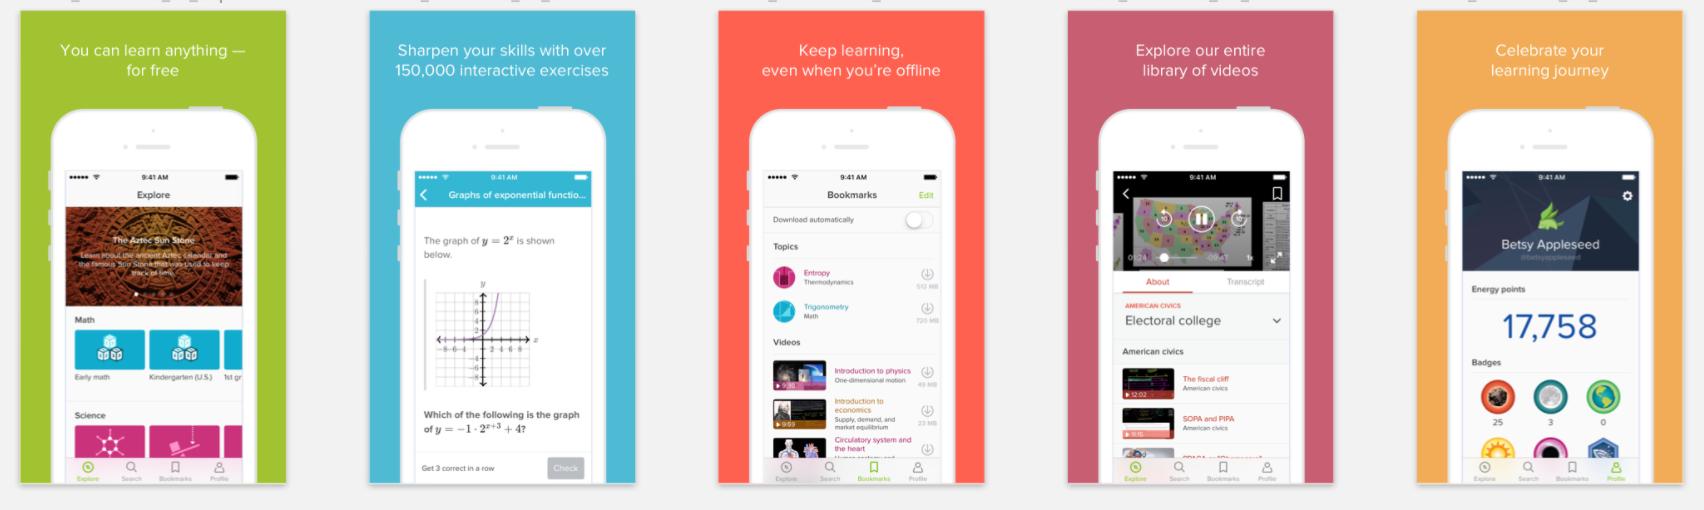 khan academy mobile app screens